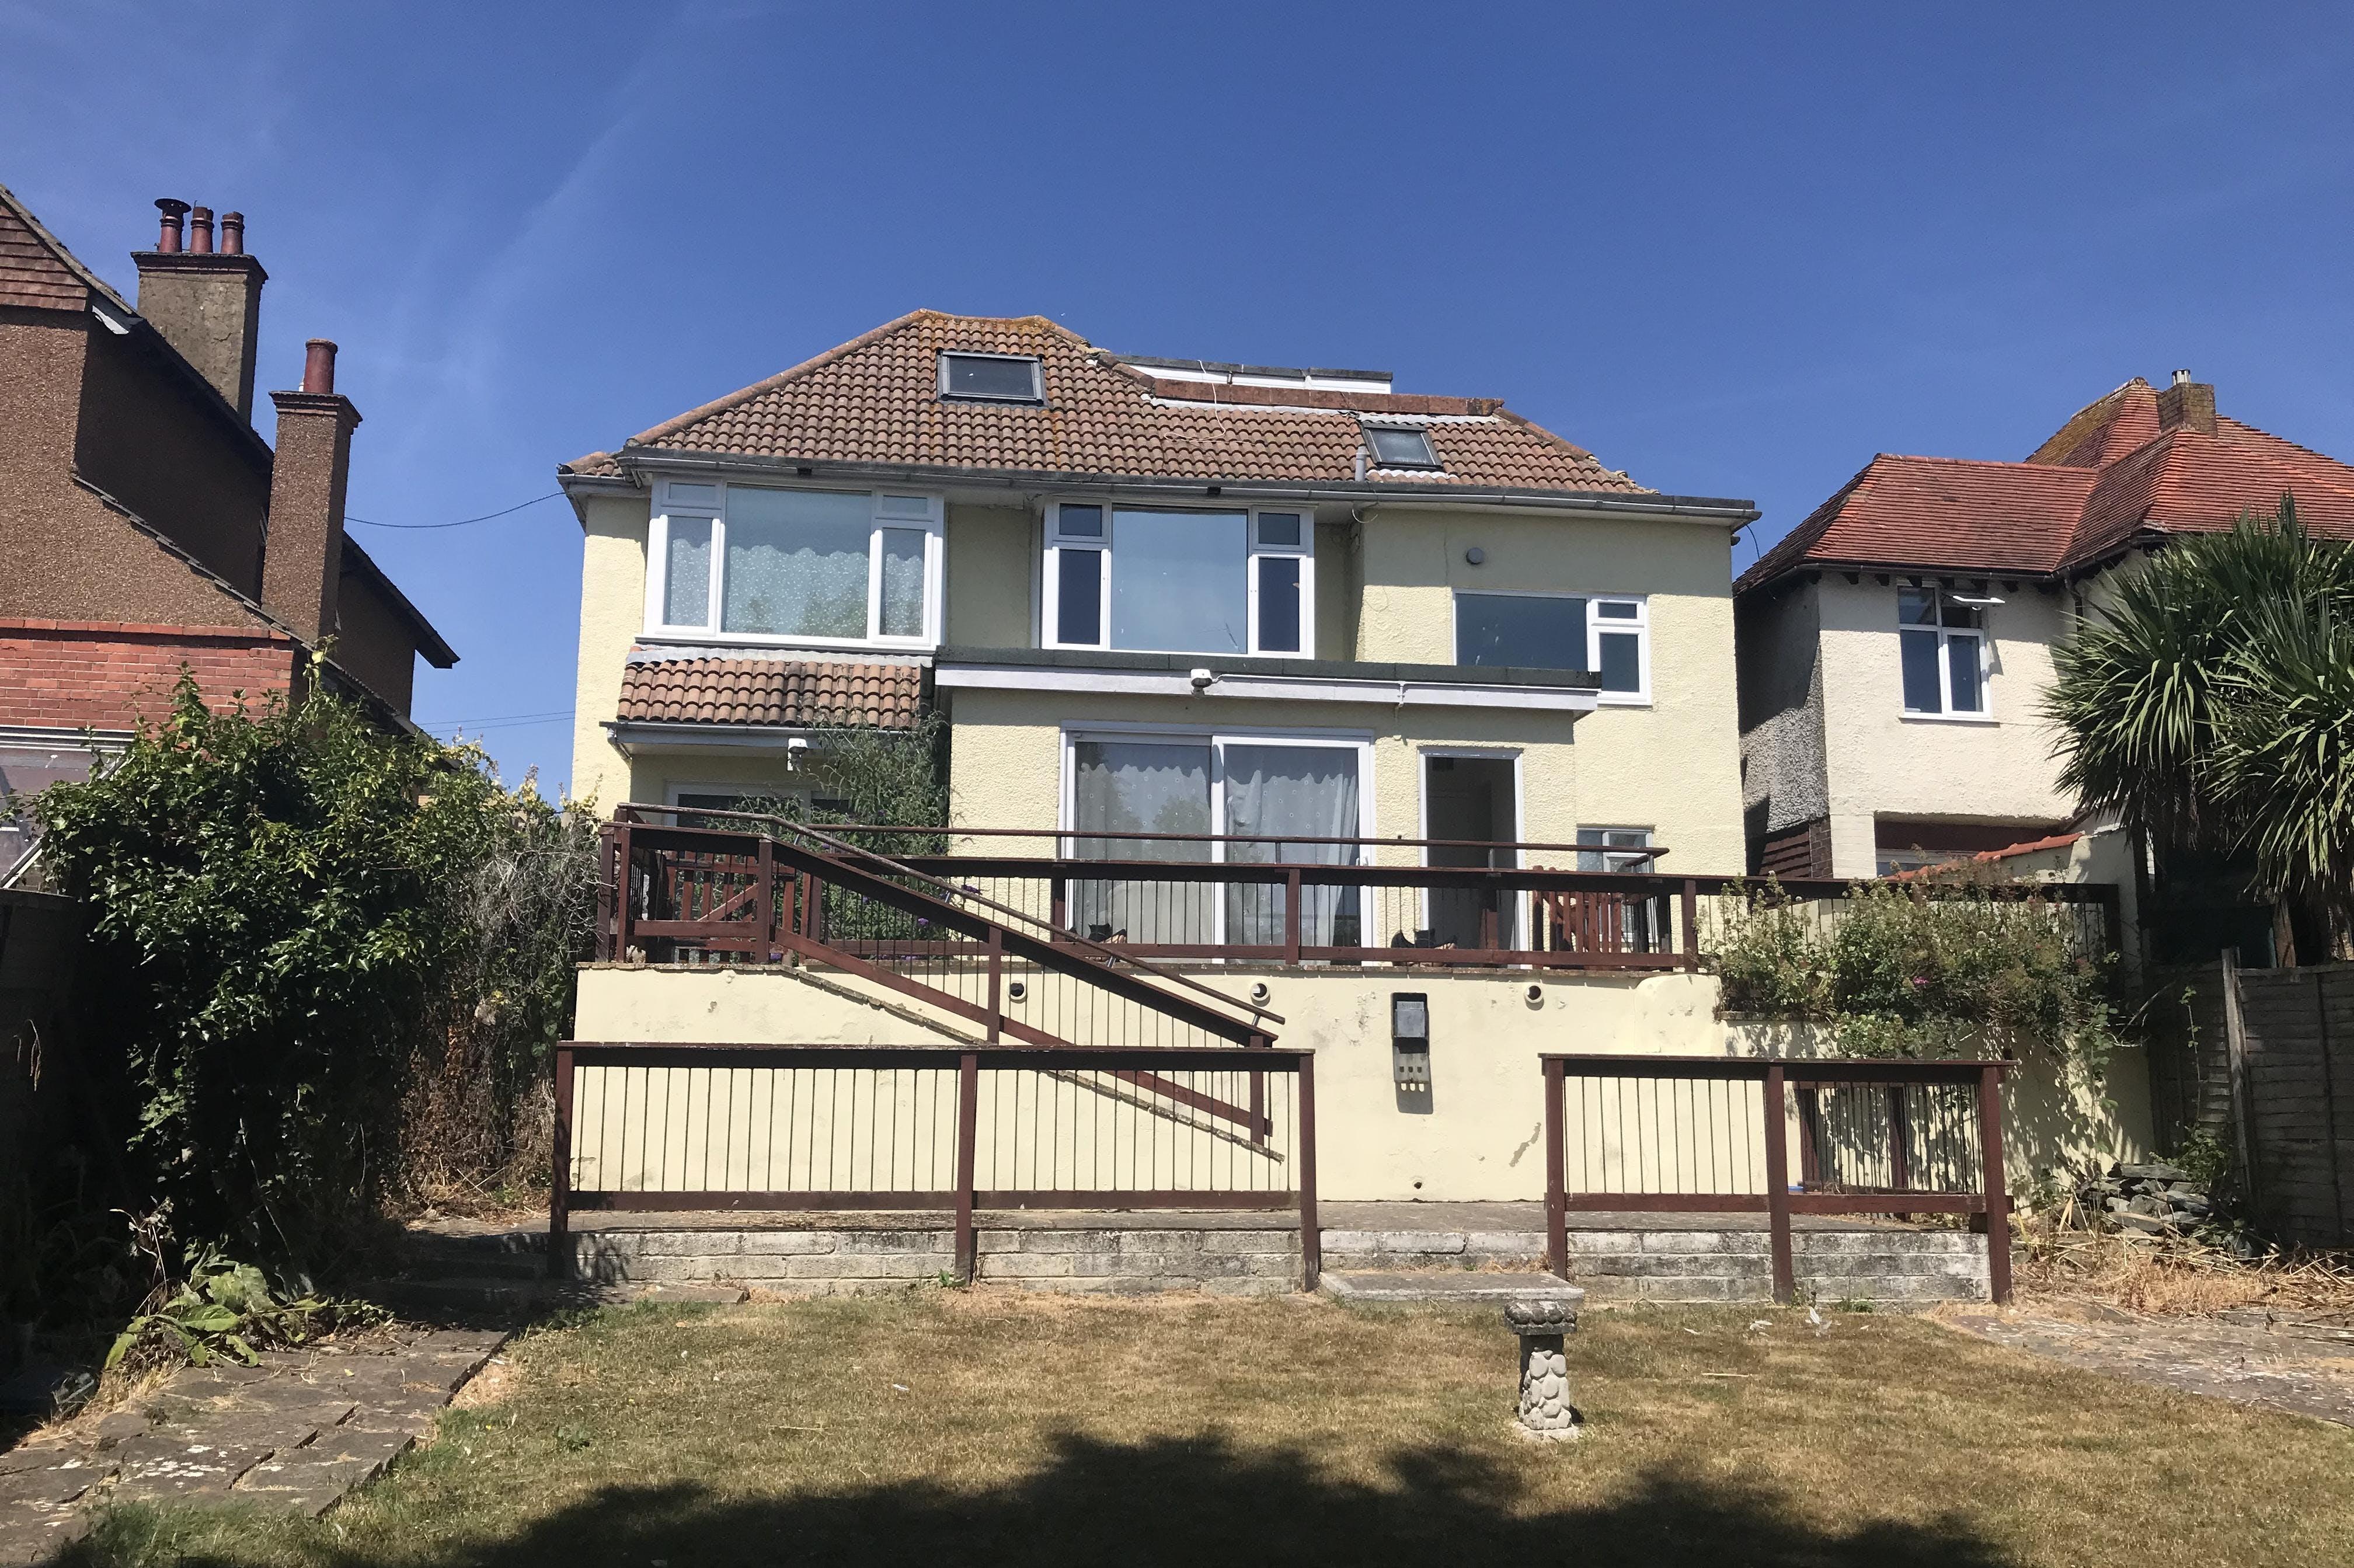 148 De La Warr Road, Bexhill On Sea, Residential For Sale - IMG_9616.JPG